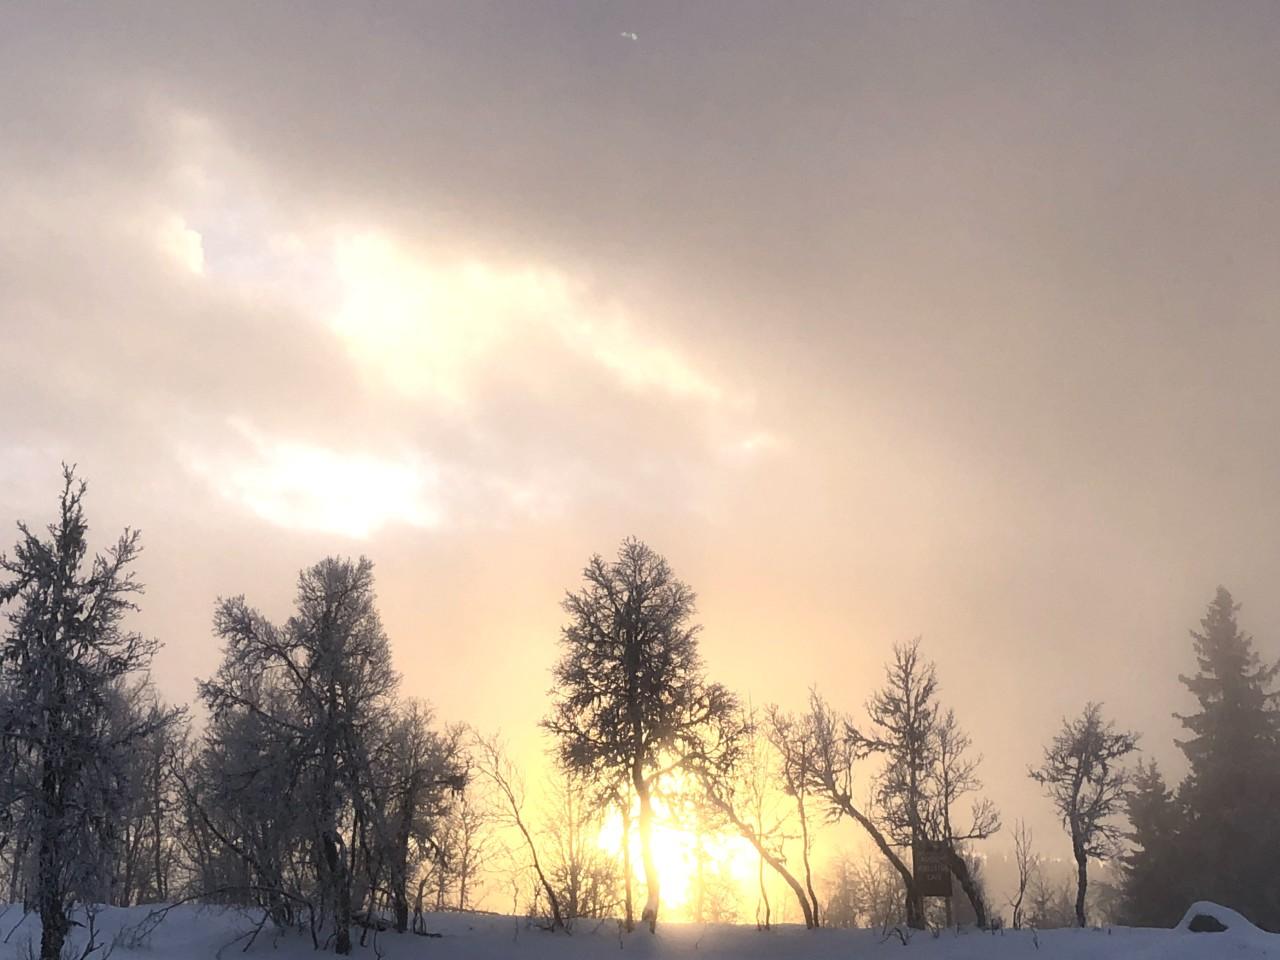 sno-vinter-gausdal-skeikampen-austlid-norge-green-house